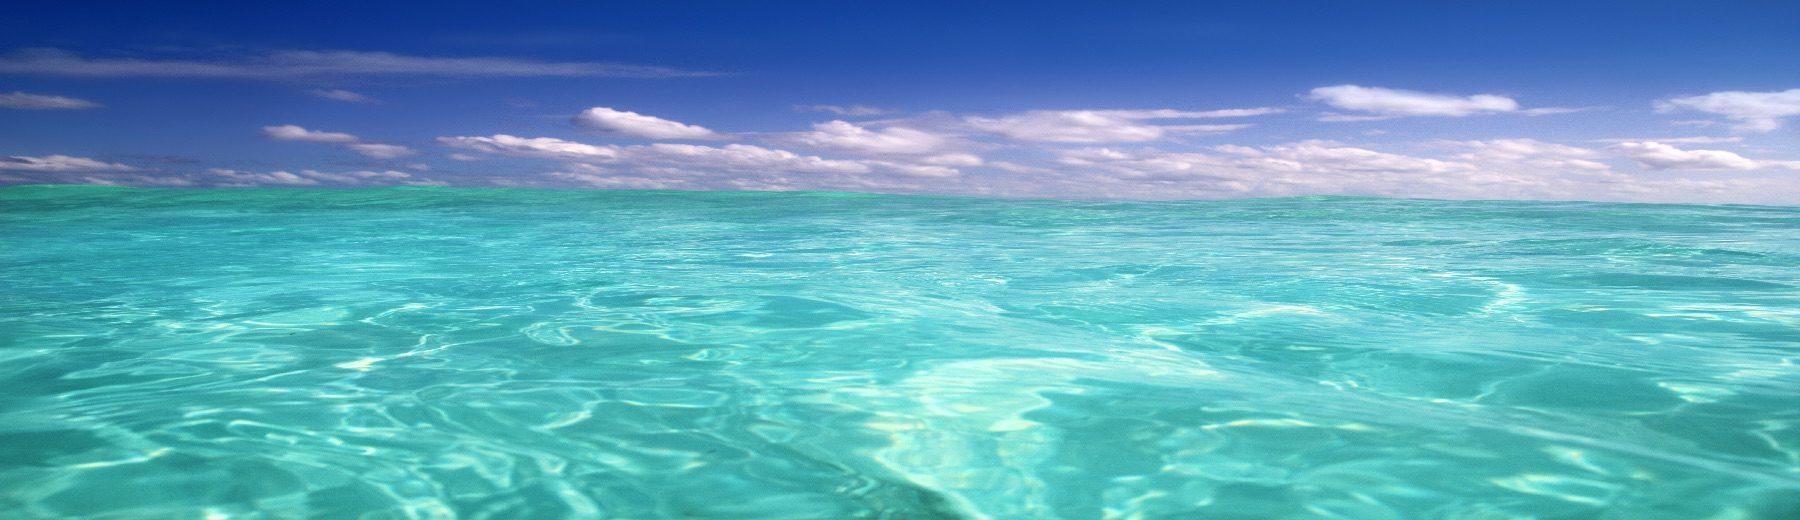 Playa Realtors- Playa del Carmen Real Estate Agency